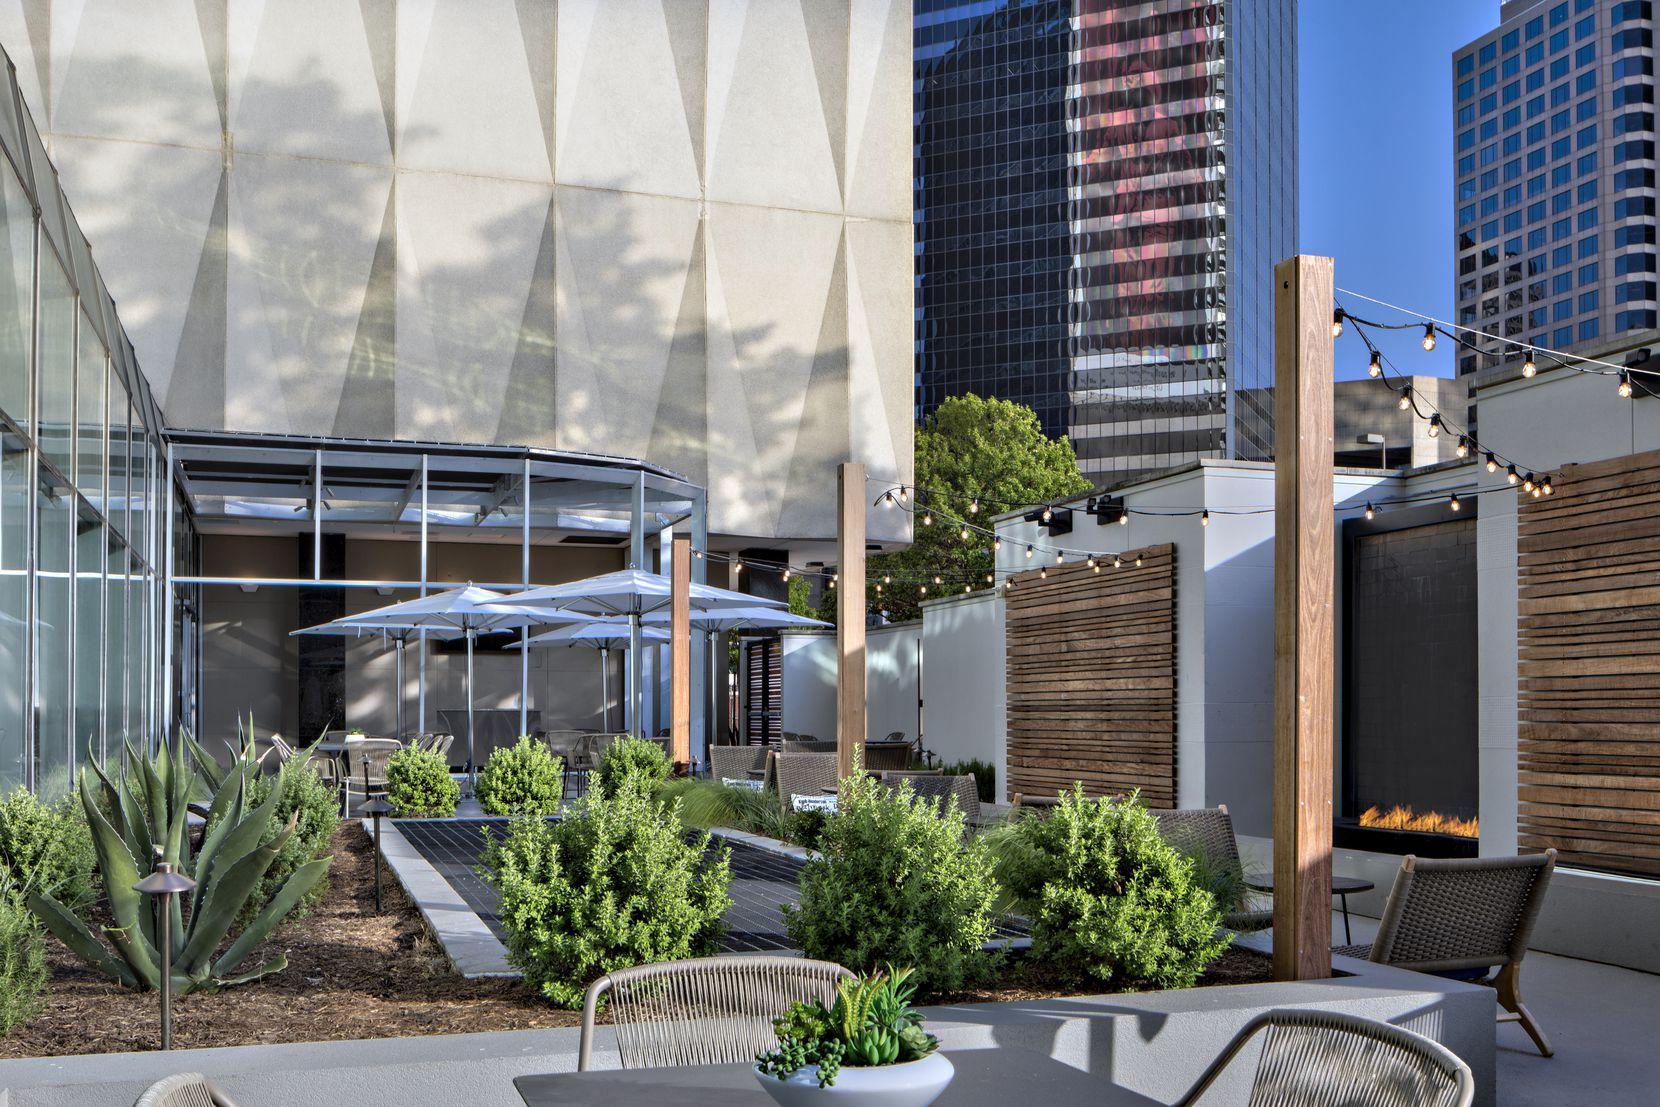 A new courtyard area at the Sheraton Dallas.